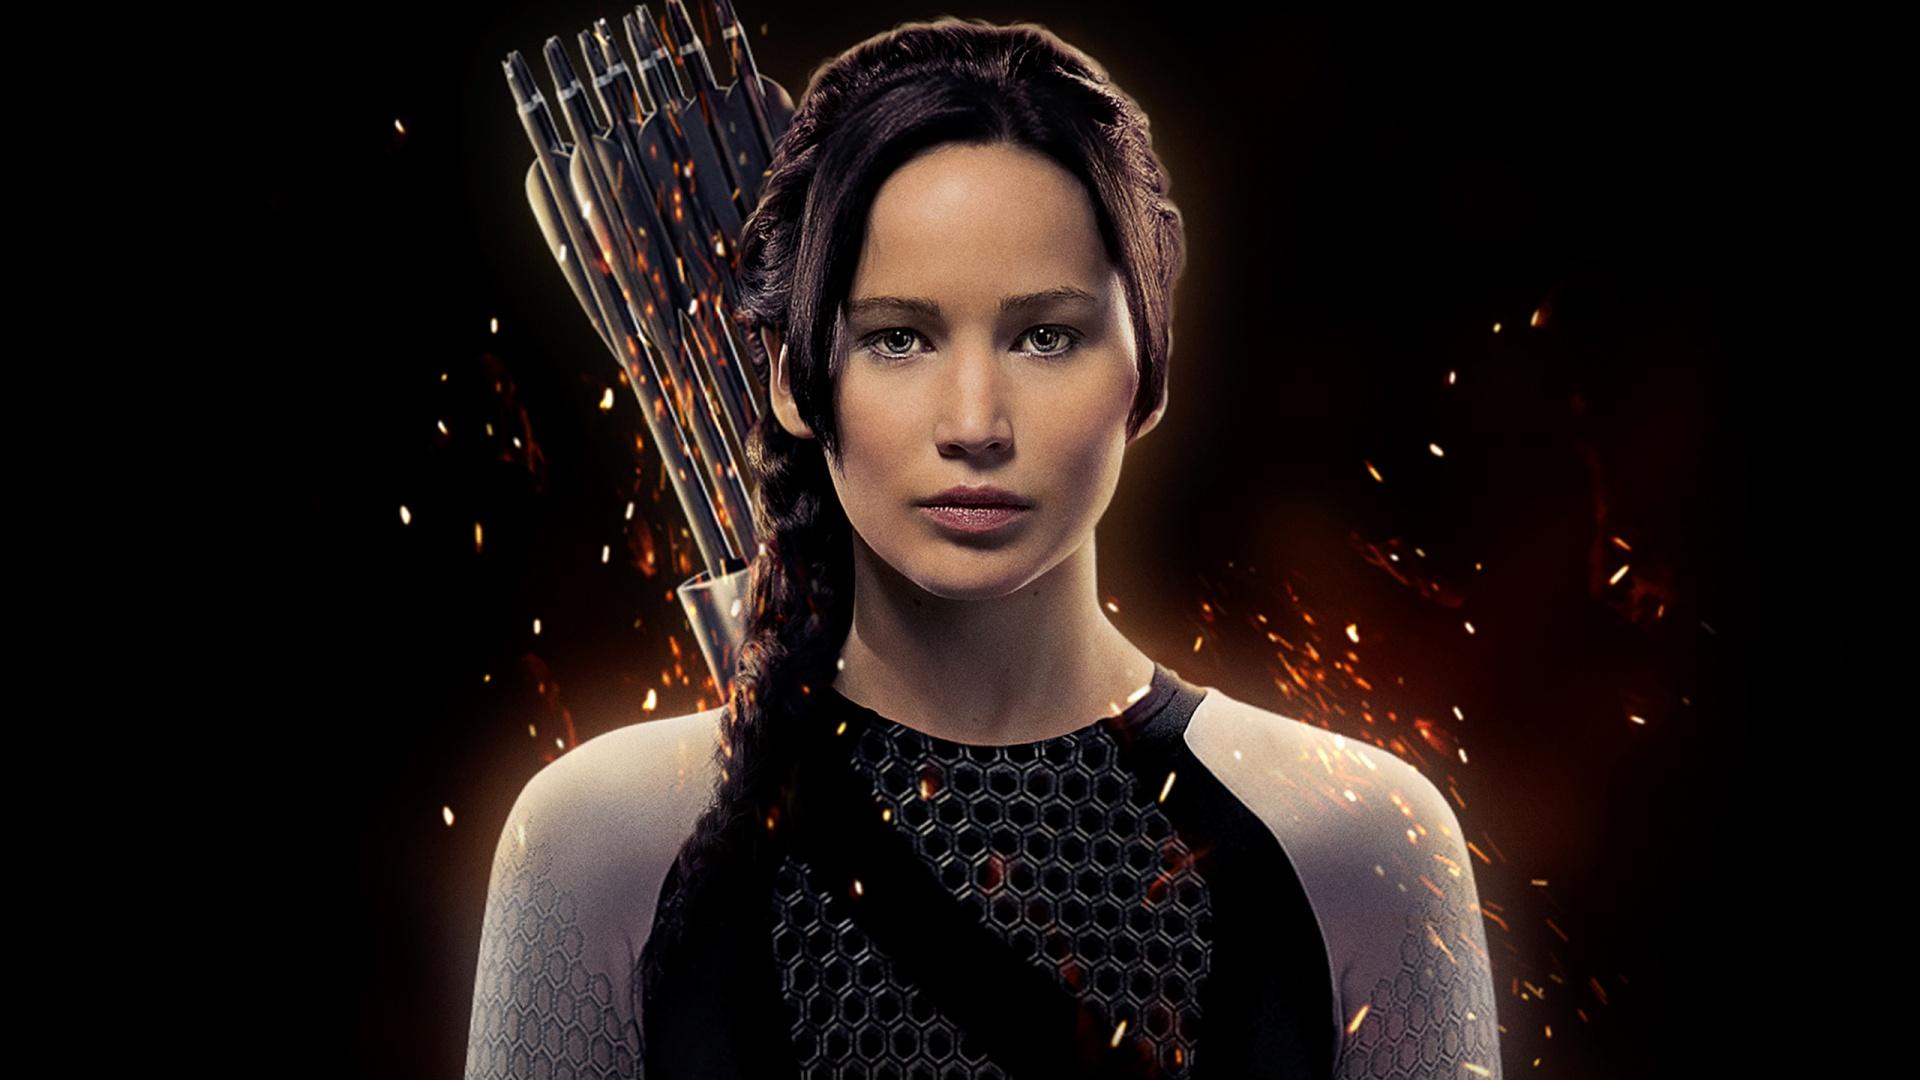 Jennifer Lawrence as Katniss Wallpapers HD Wallpapers 1920x1080